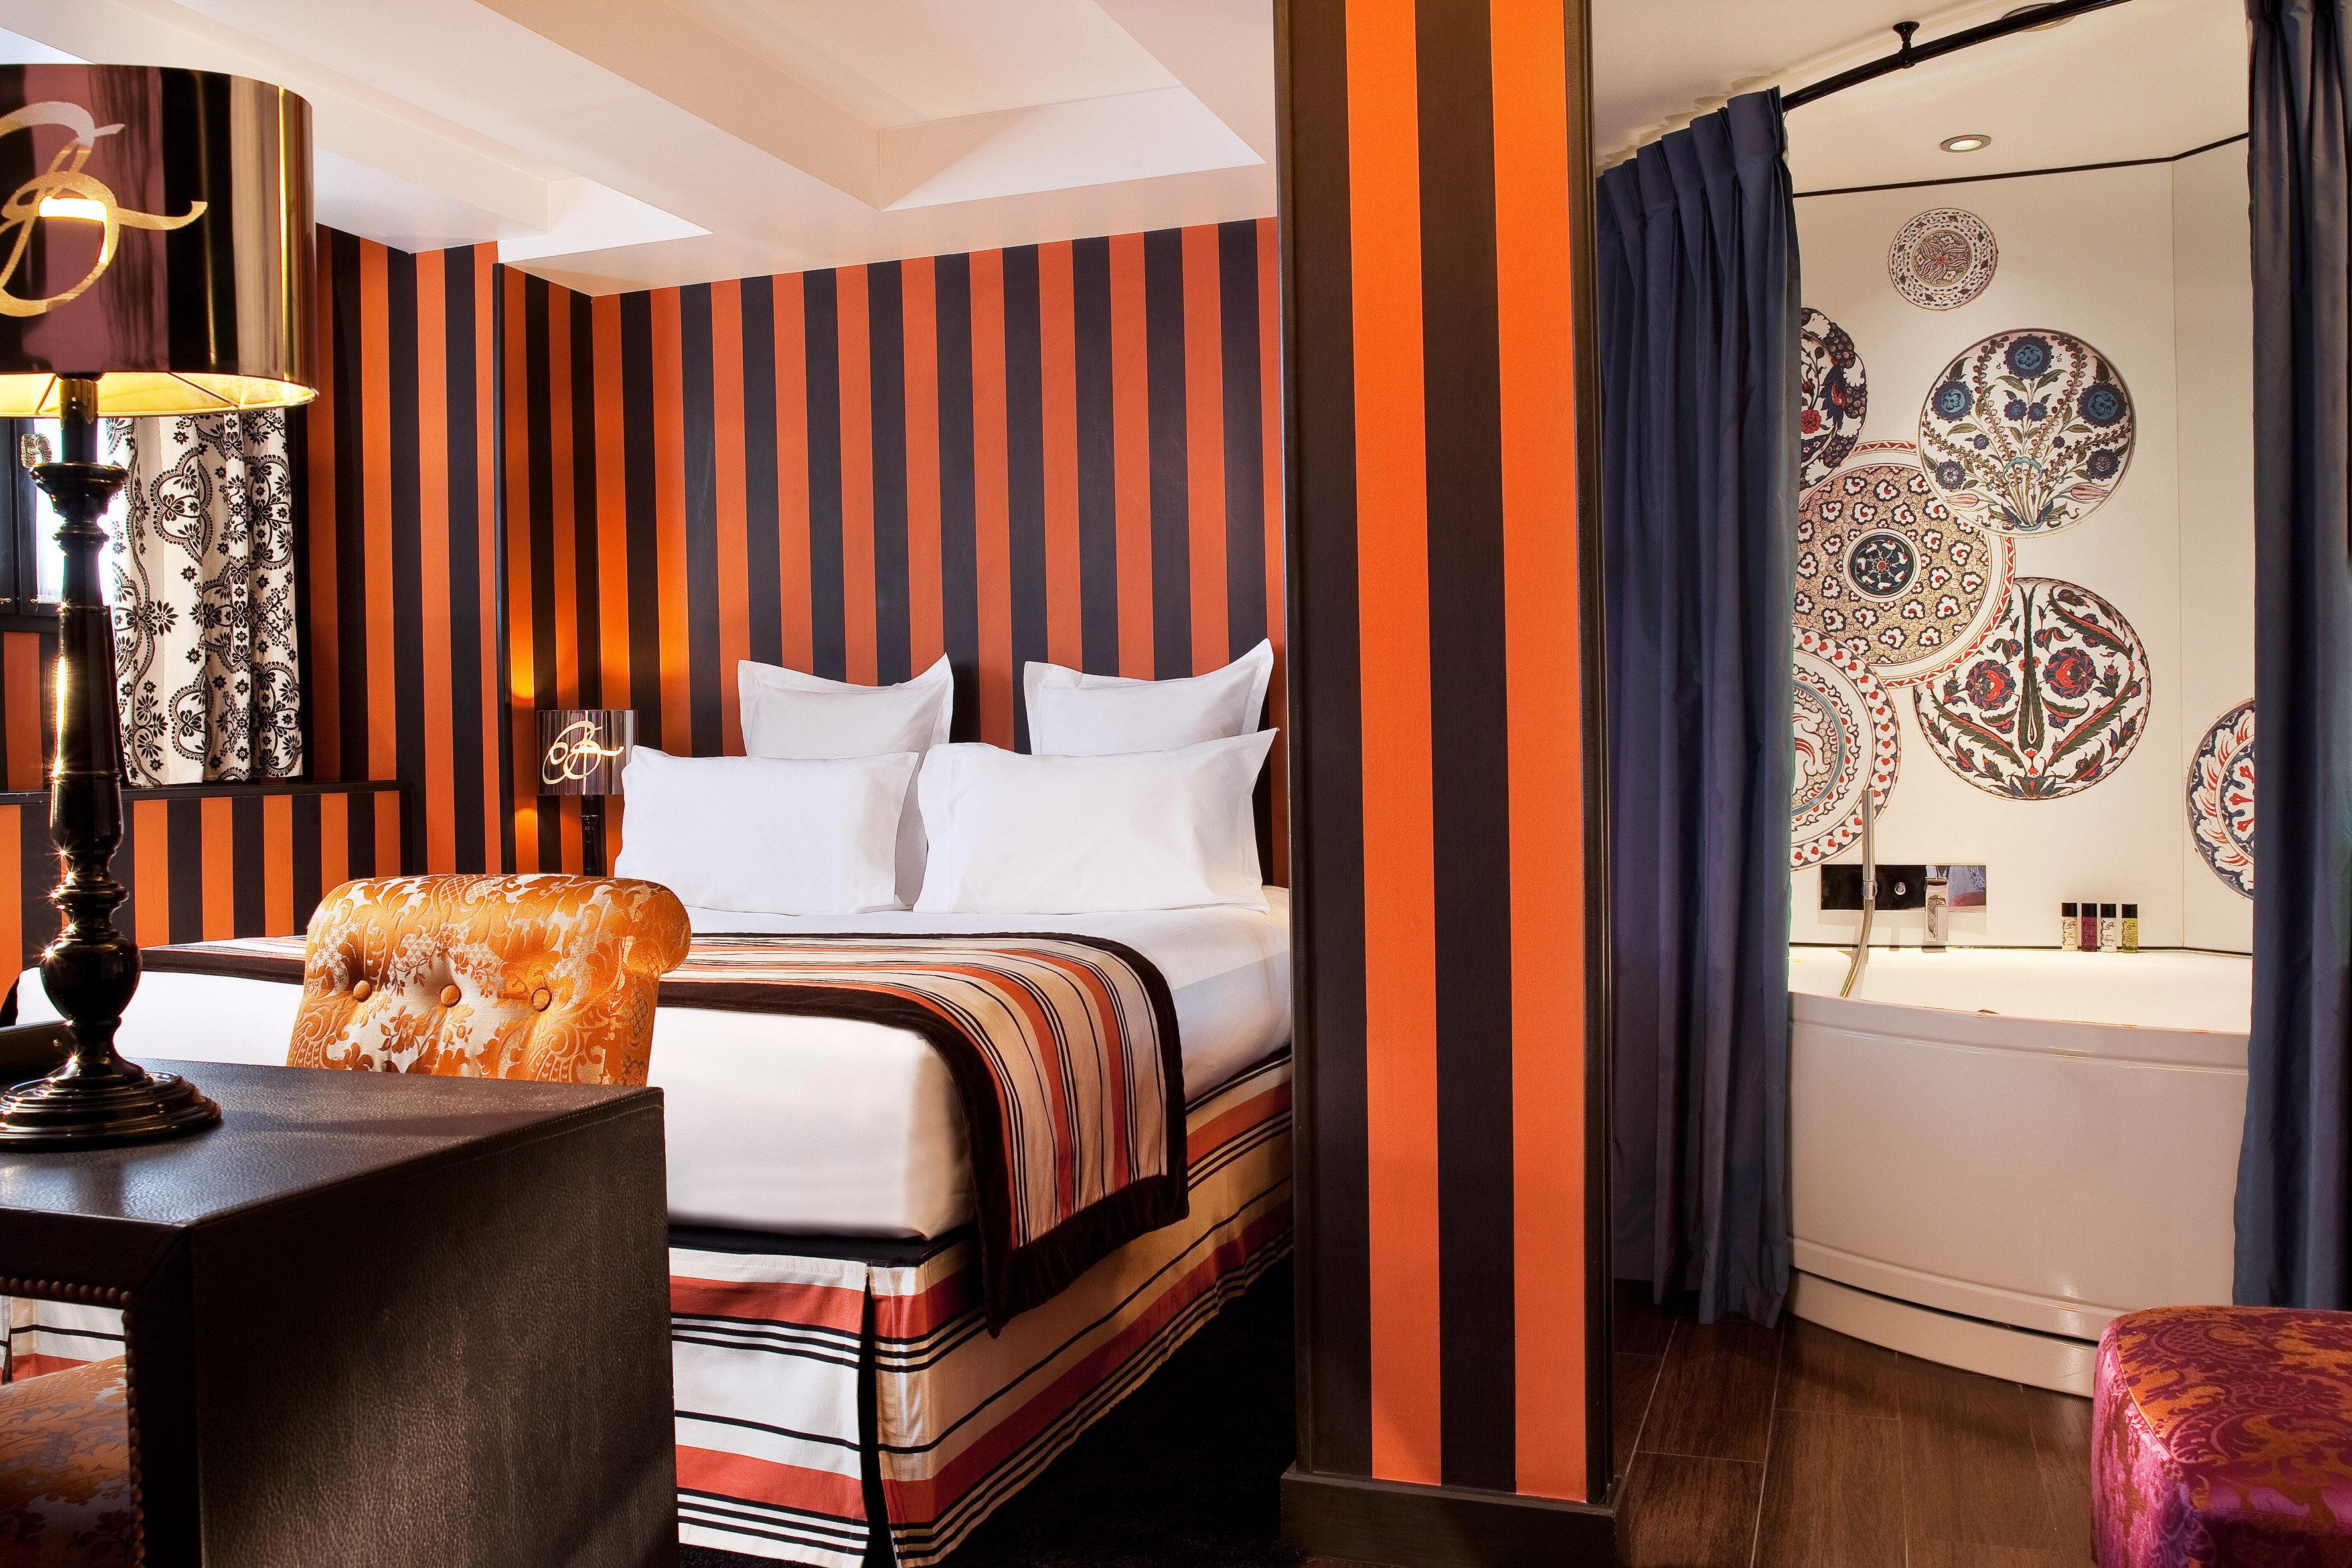 Bedroom Elegant Luxury Modern Romantic Suite chair home living room curtain cottage